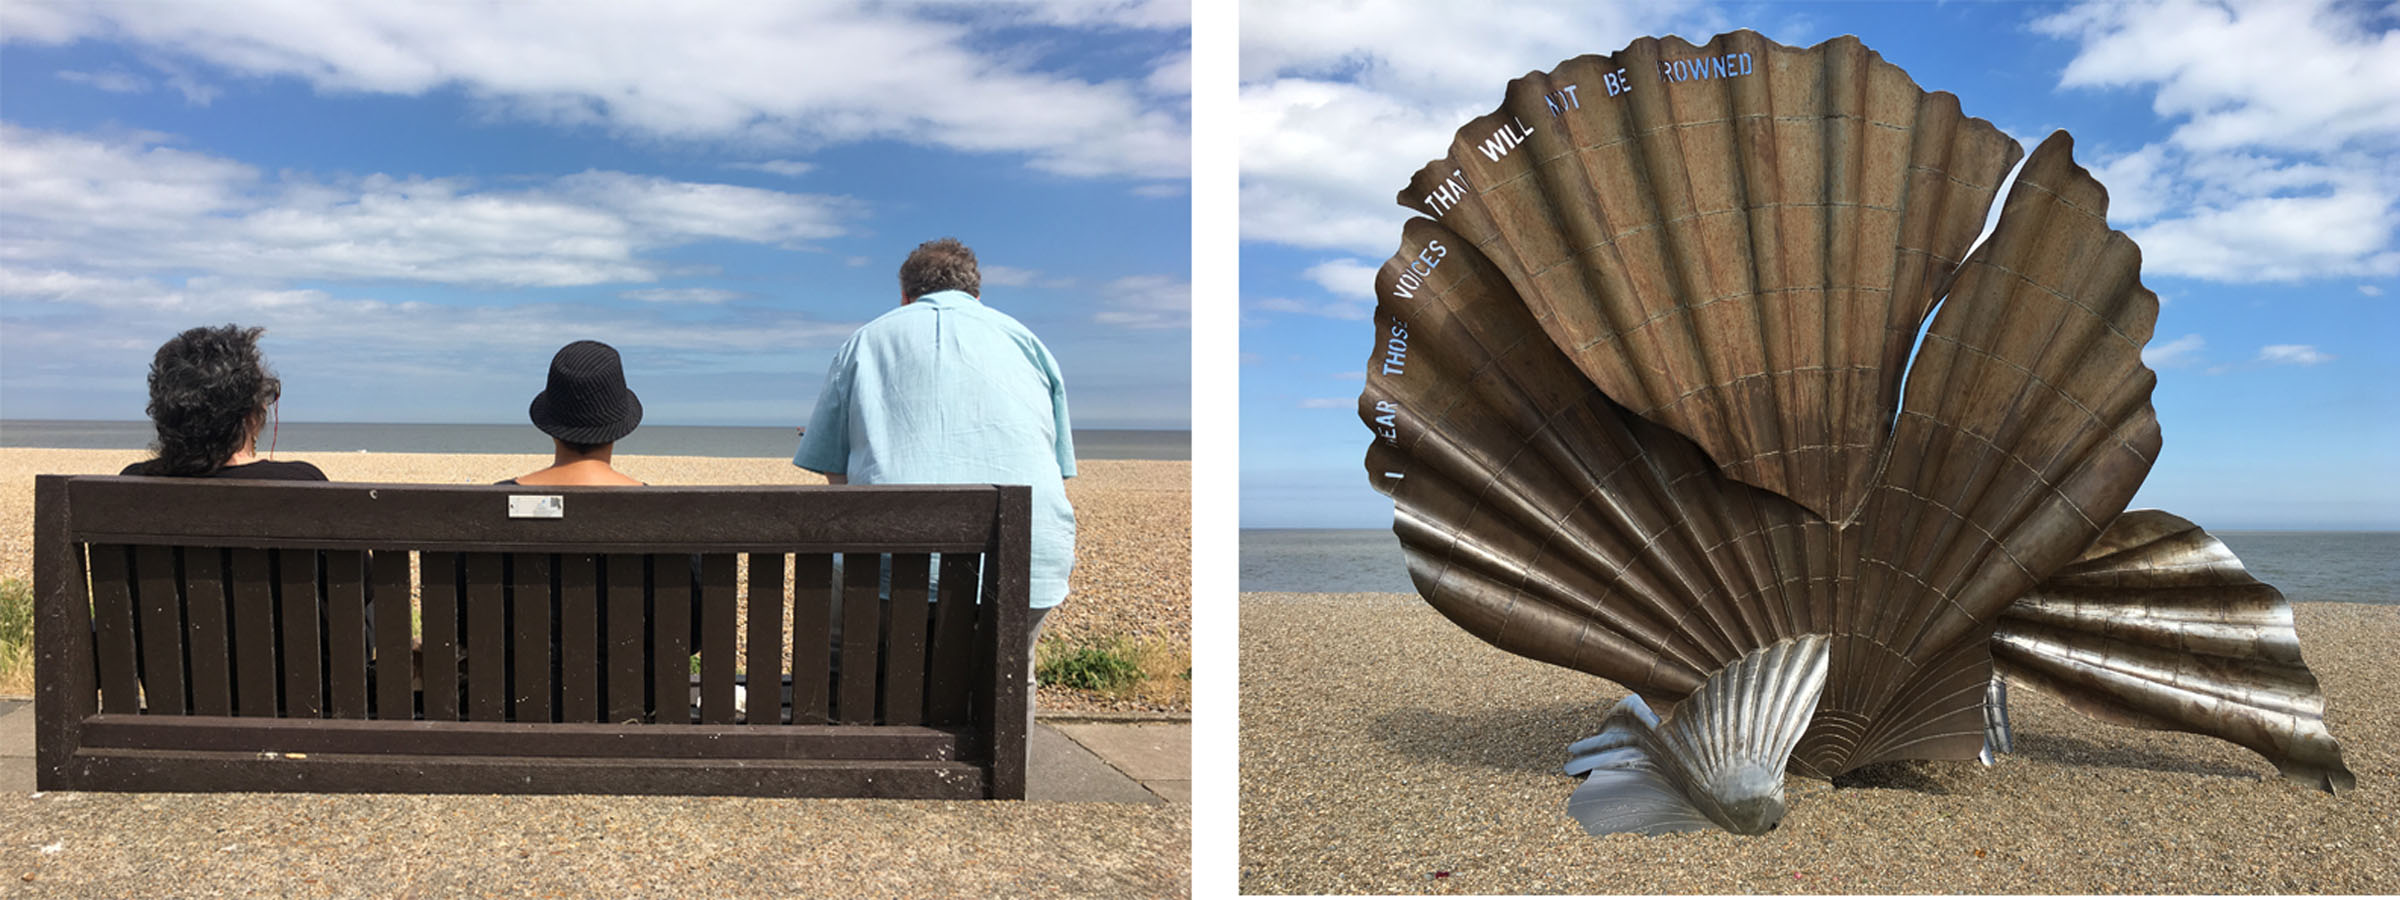 Maggi-Hambling-sculpture